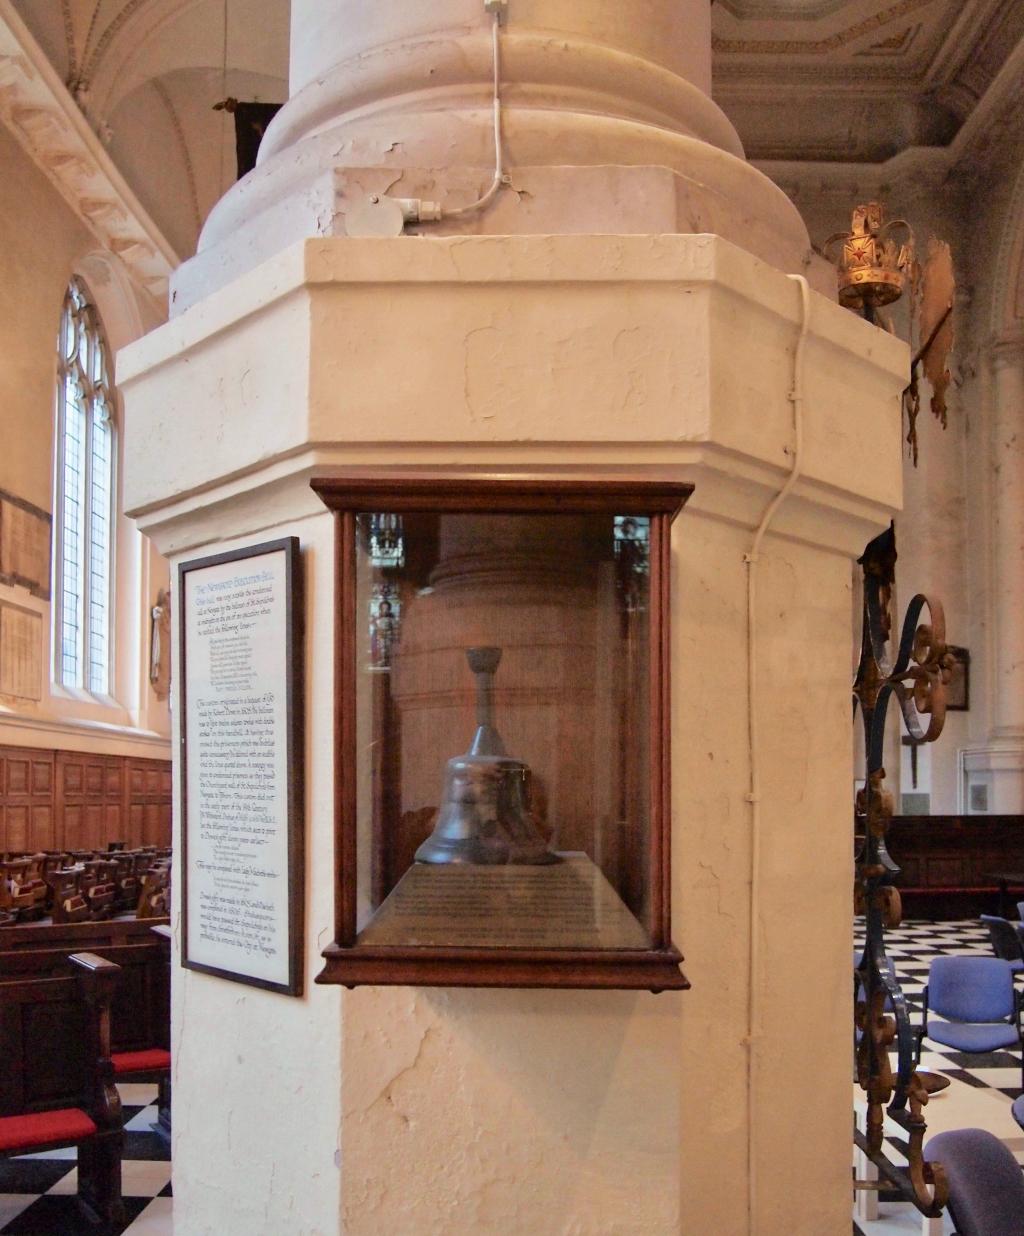 My London Walks: Newgate Execution Bell